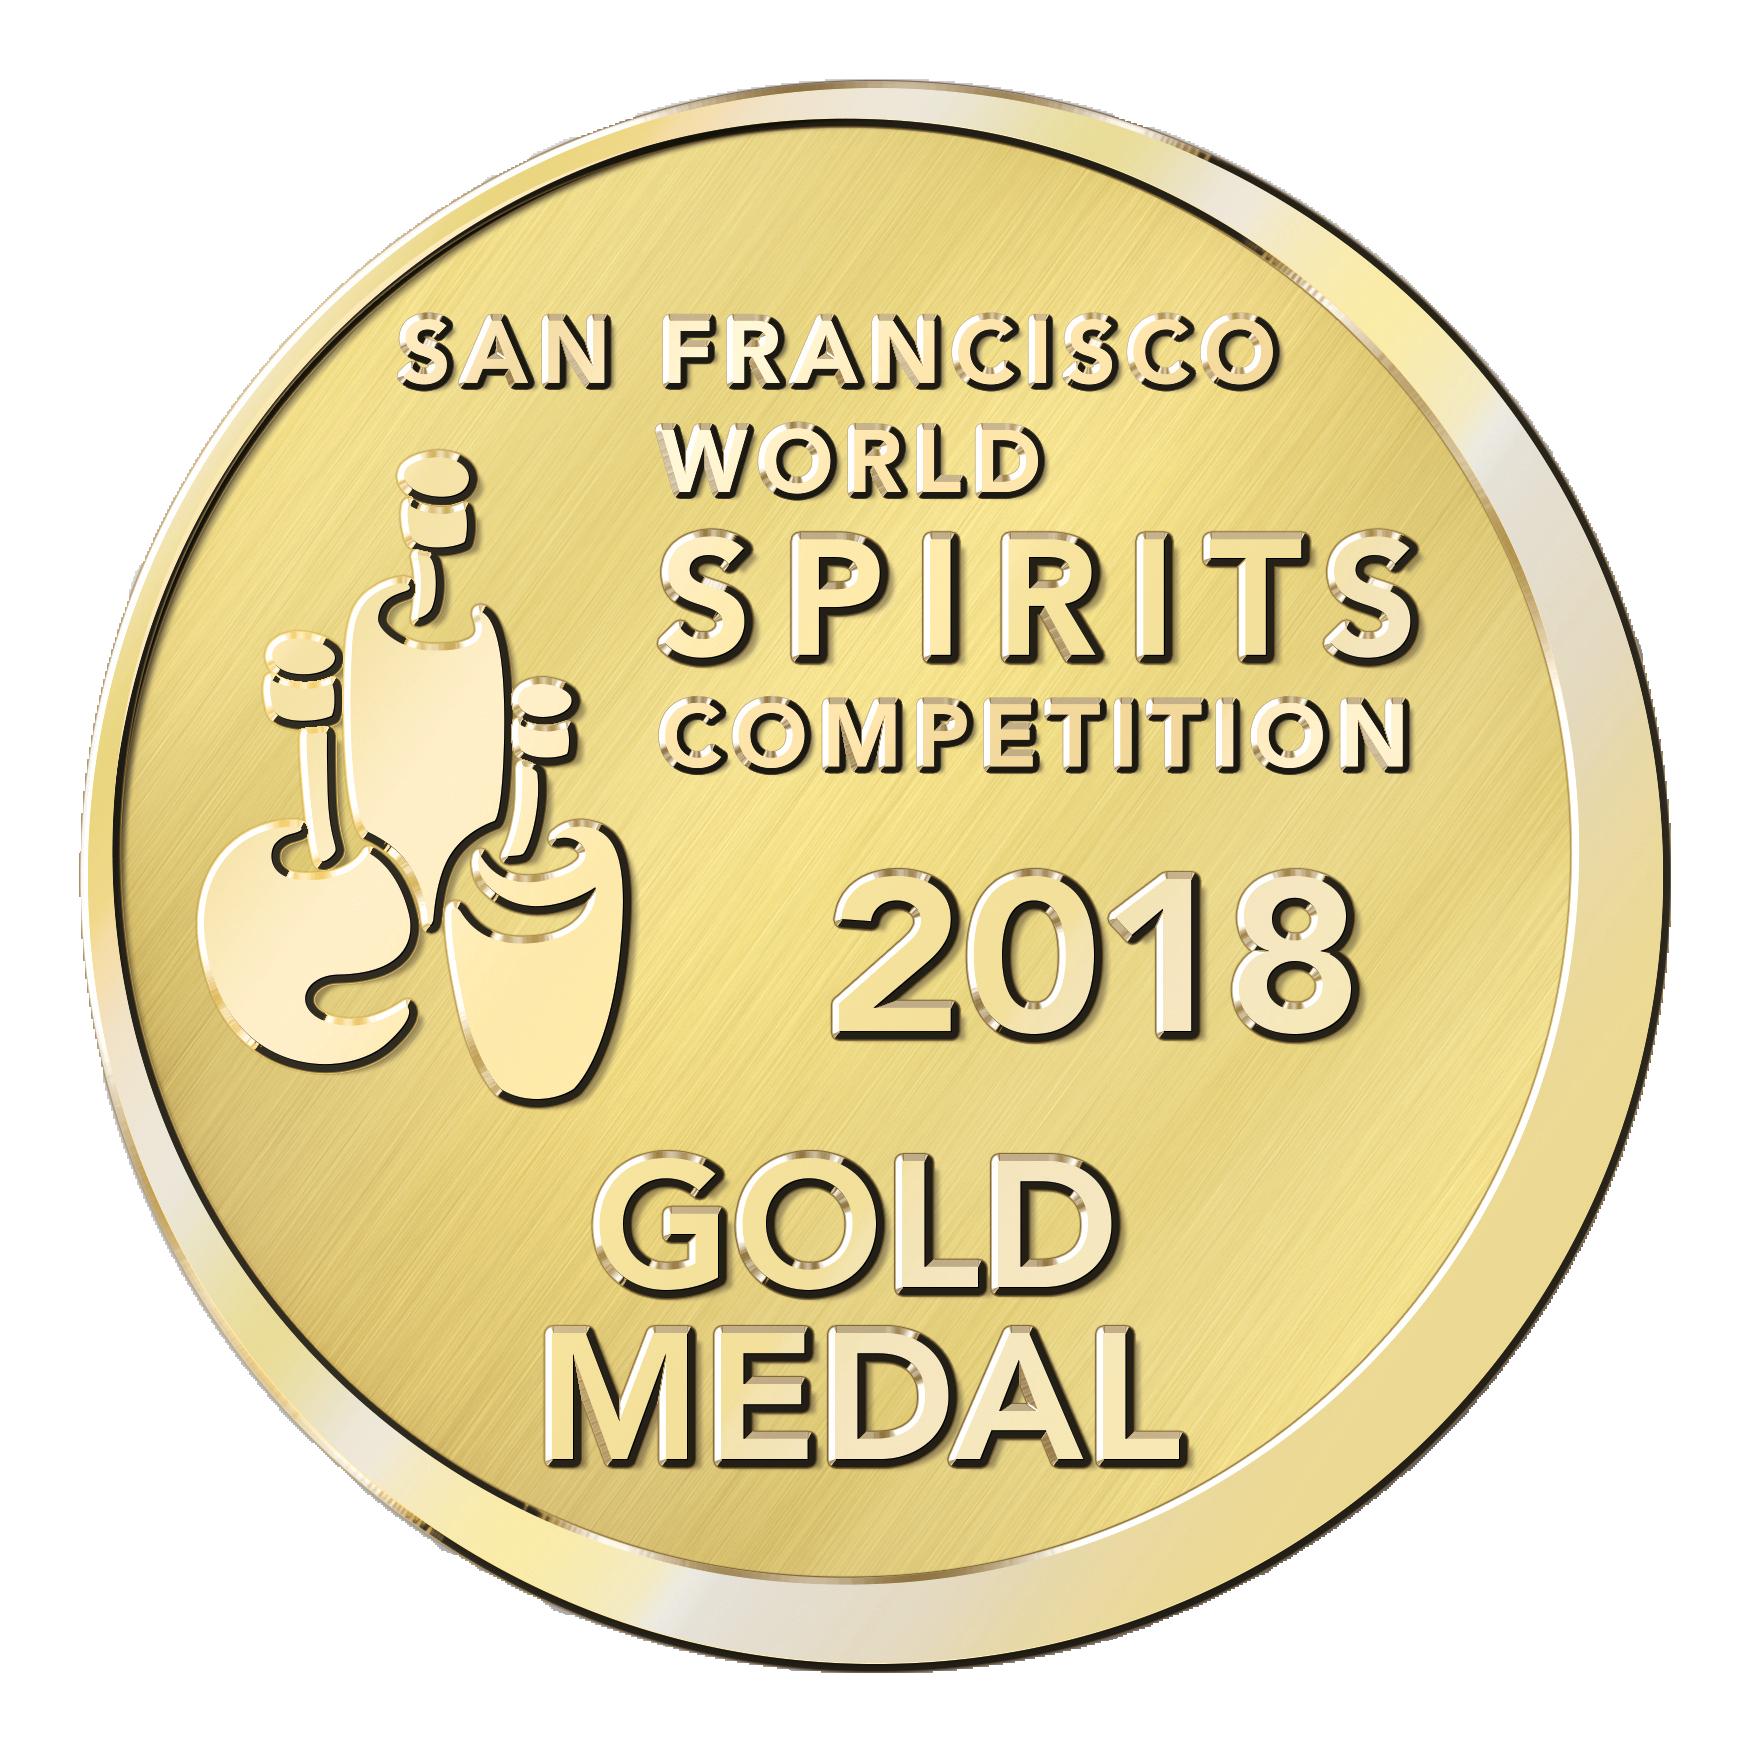 Stiggins' Fancy : San Francisco World Spirits Competition 2018, Gold Medal, USA